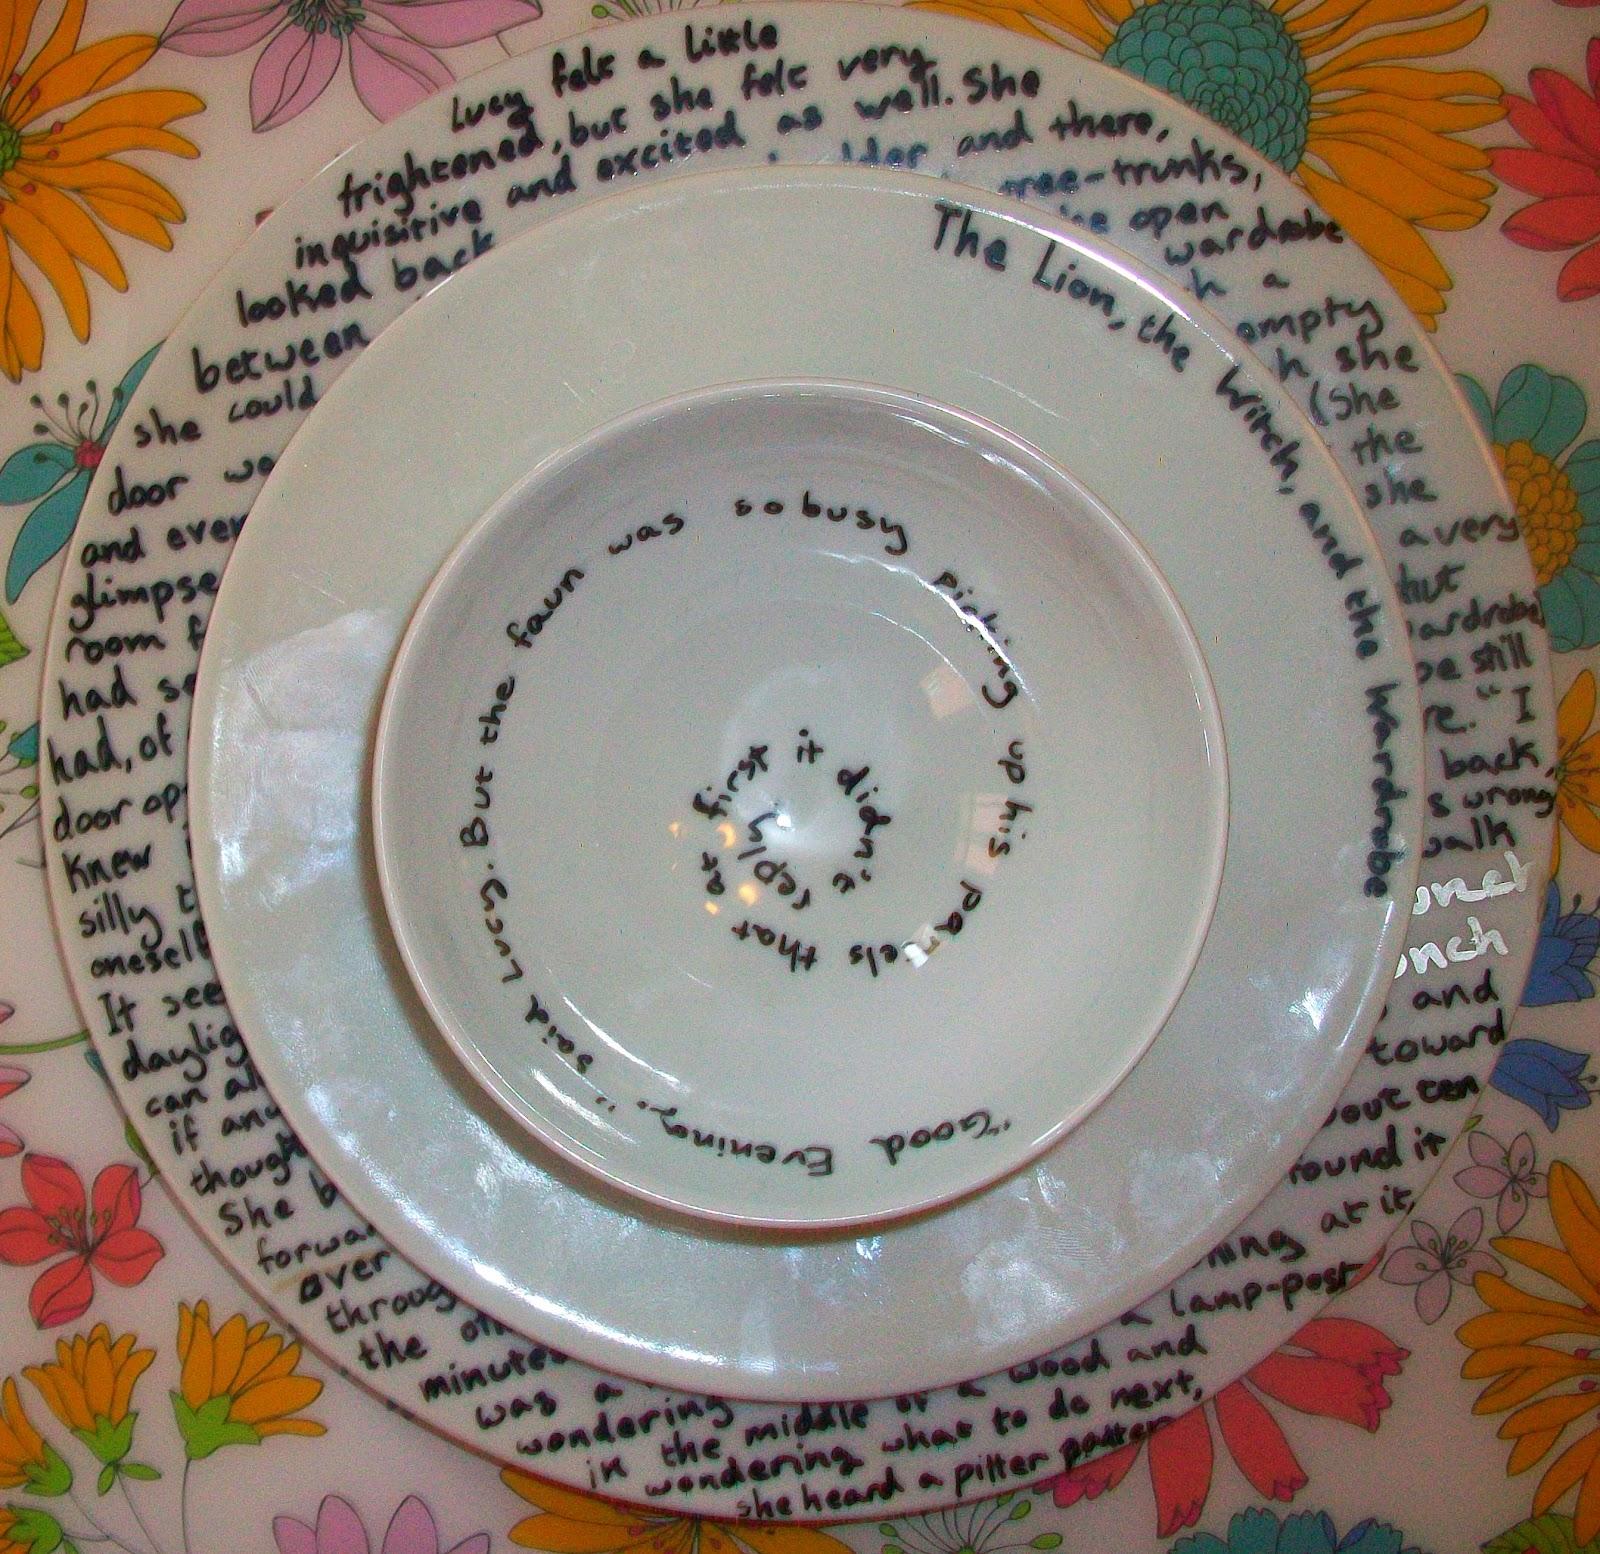 Tuesday July 10 2012 & Created 2B Creative: Literary Dinnerware